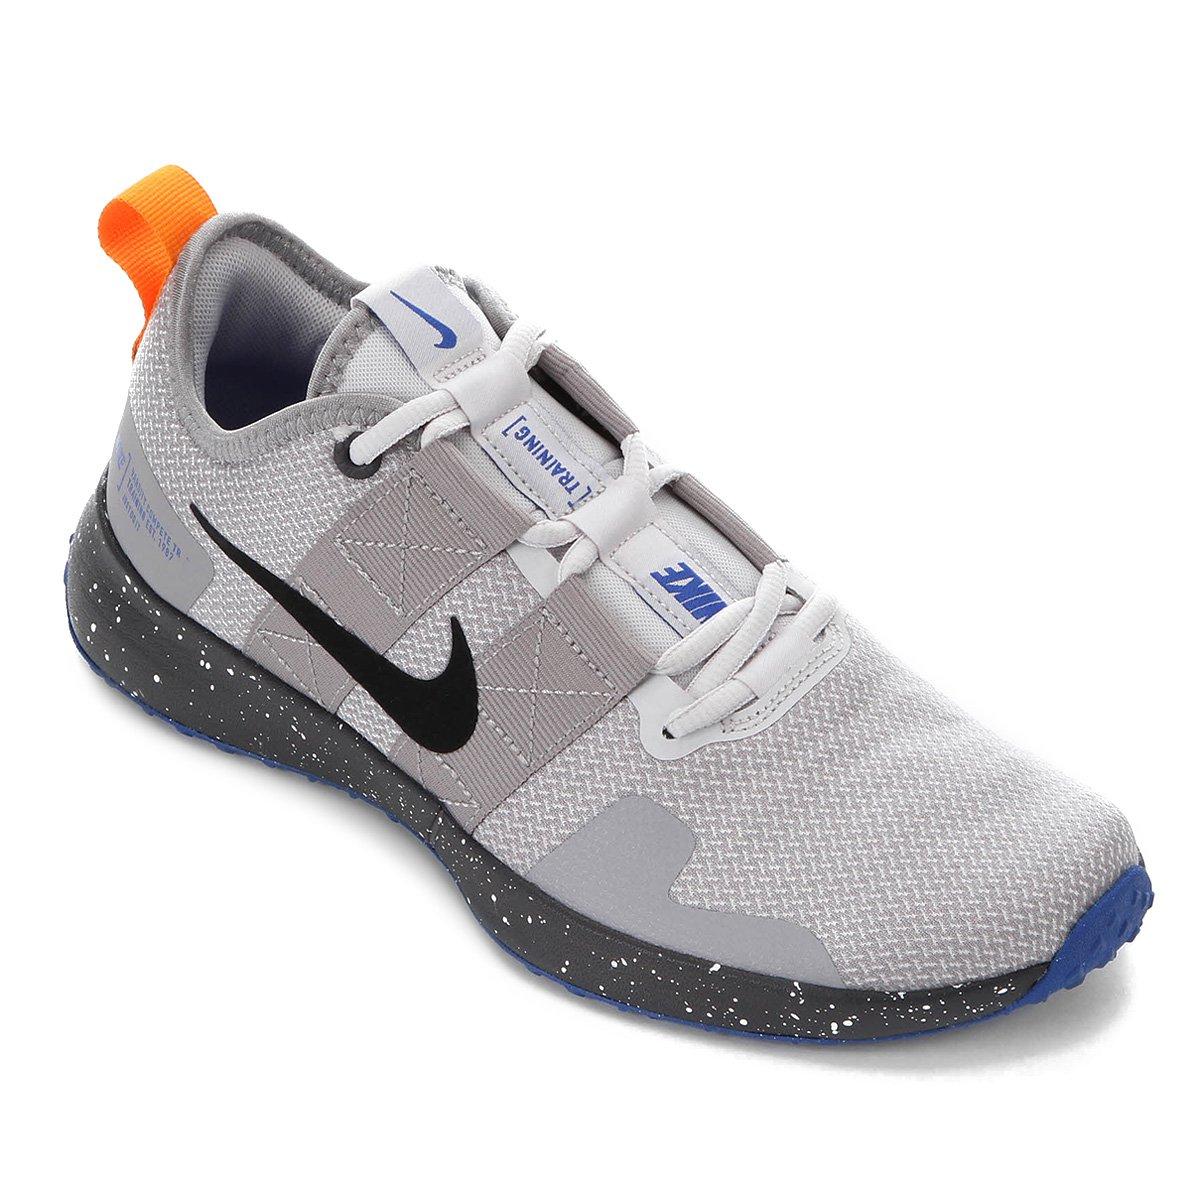 1cdf40fb4 Tênis Nike Varsity Compete Tr 2 Masculino - Cinza | Allianz Parque Shop